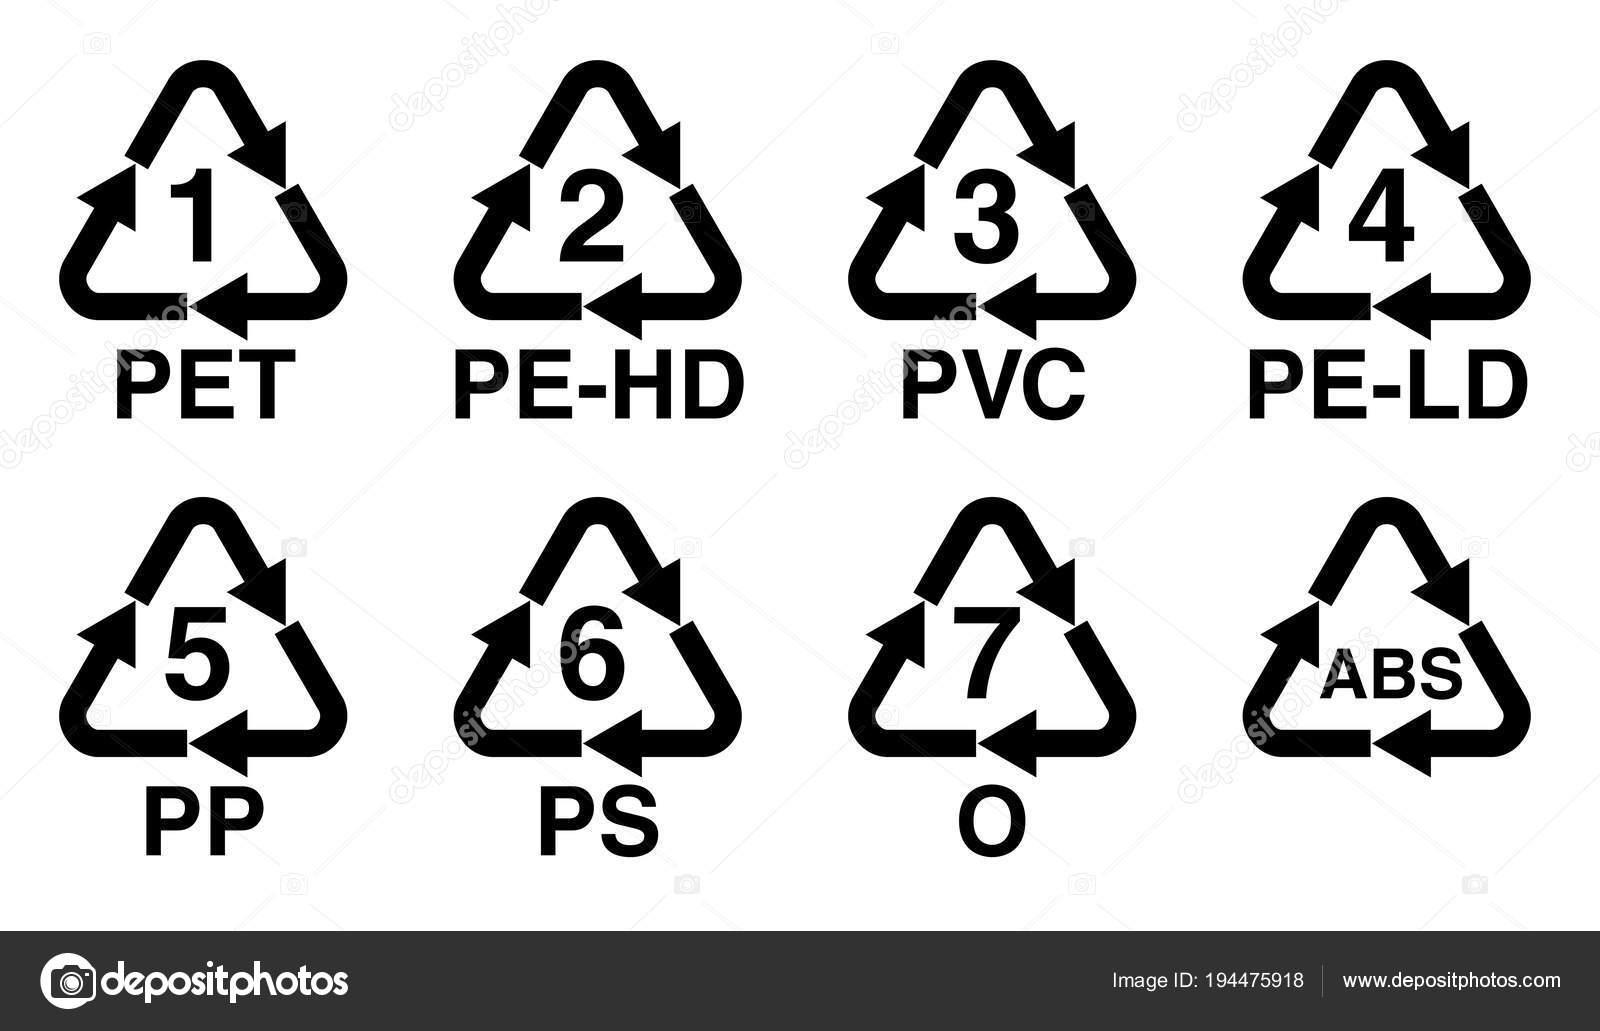 Kunststoff Recycling Symbol Recyceln Dreieck Mit Nummer